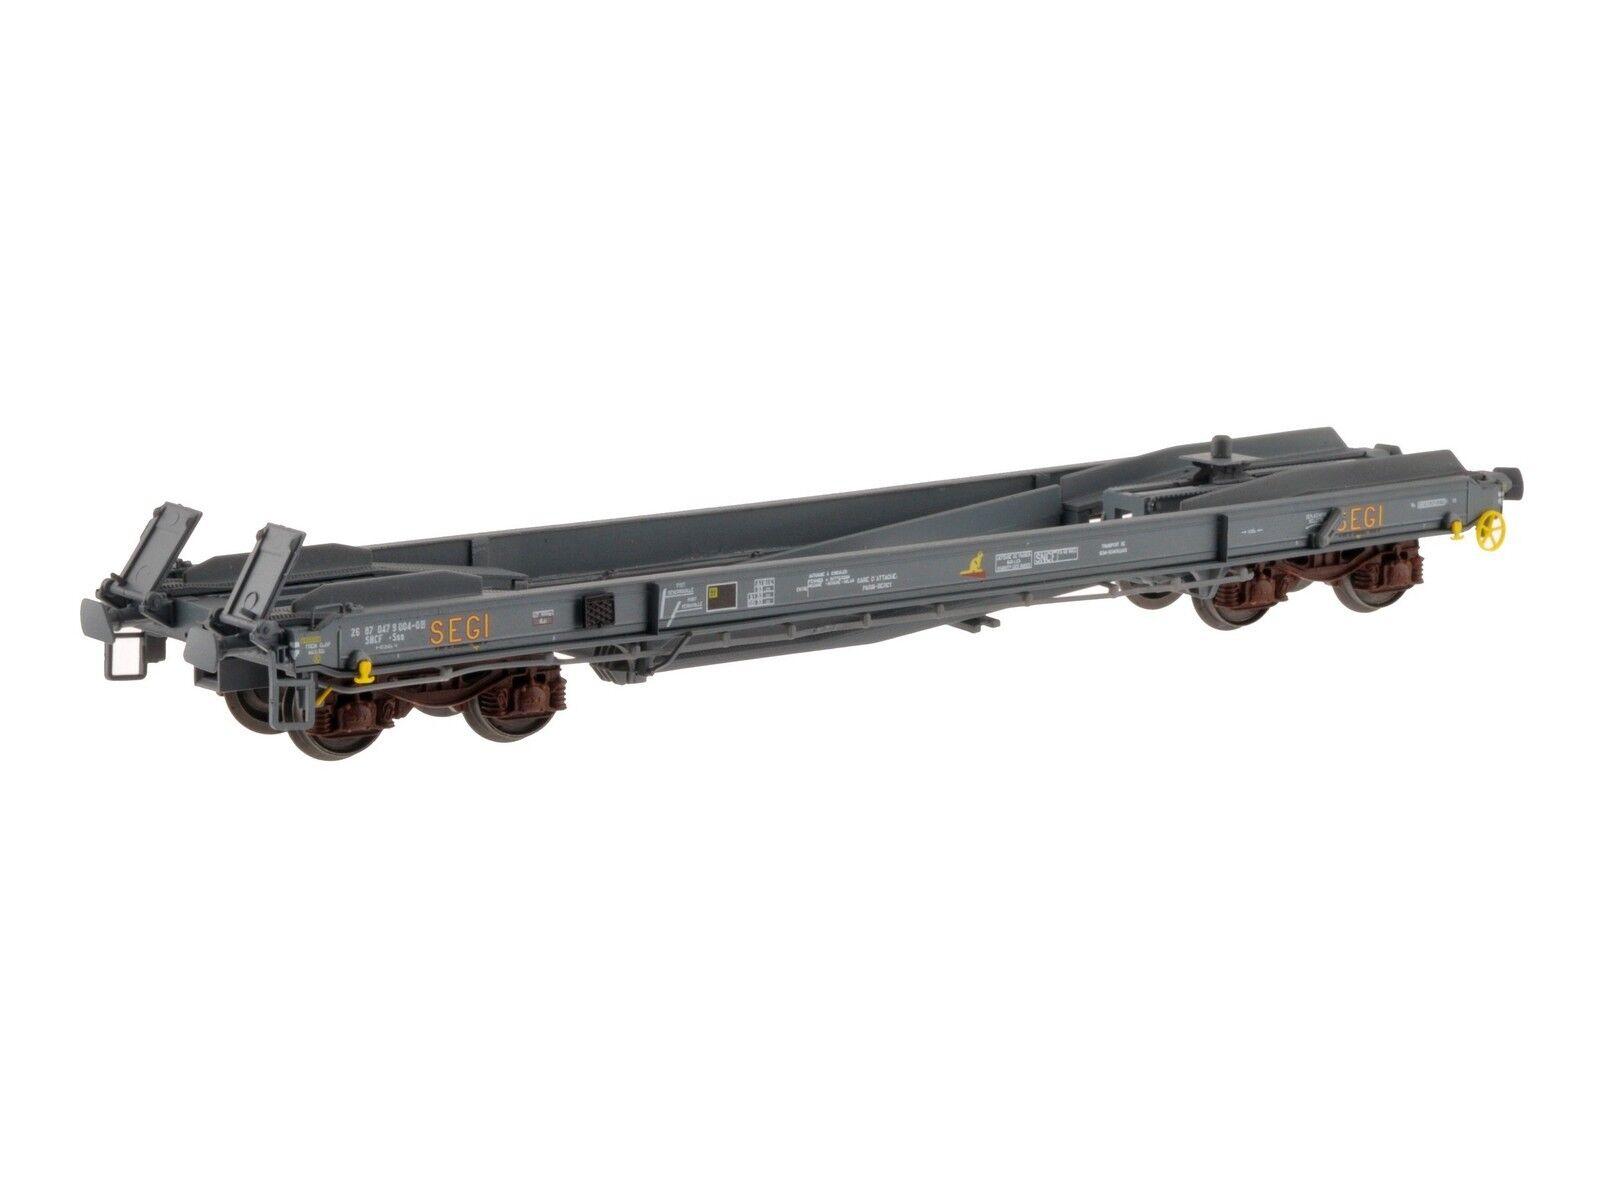 LS Models 30138 SNCF 4 ACH wechselbehältertragwg KB Nova Trans Grigio ep4 NUOVO